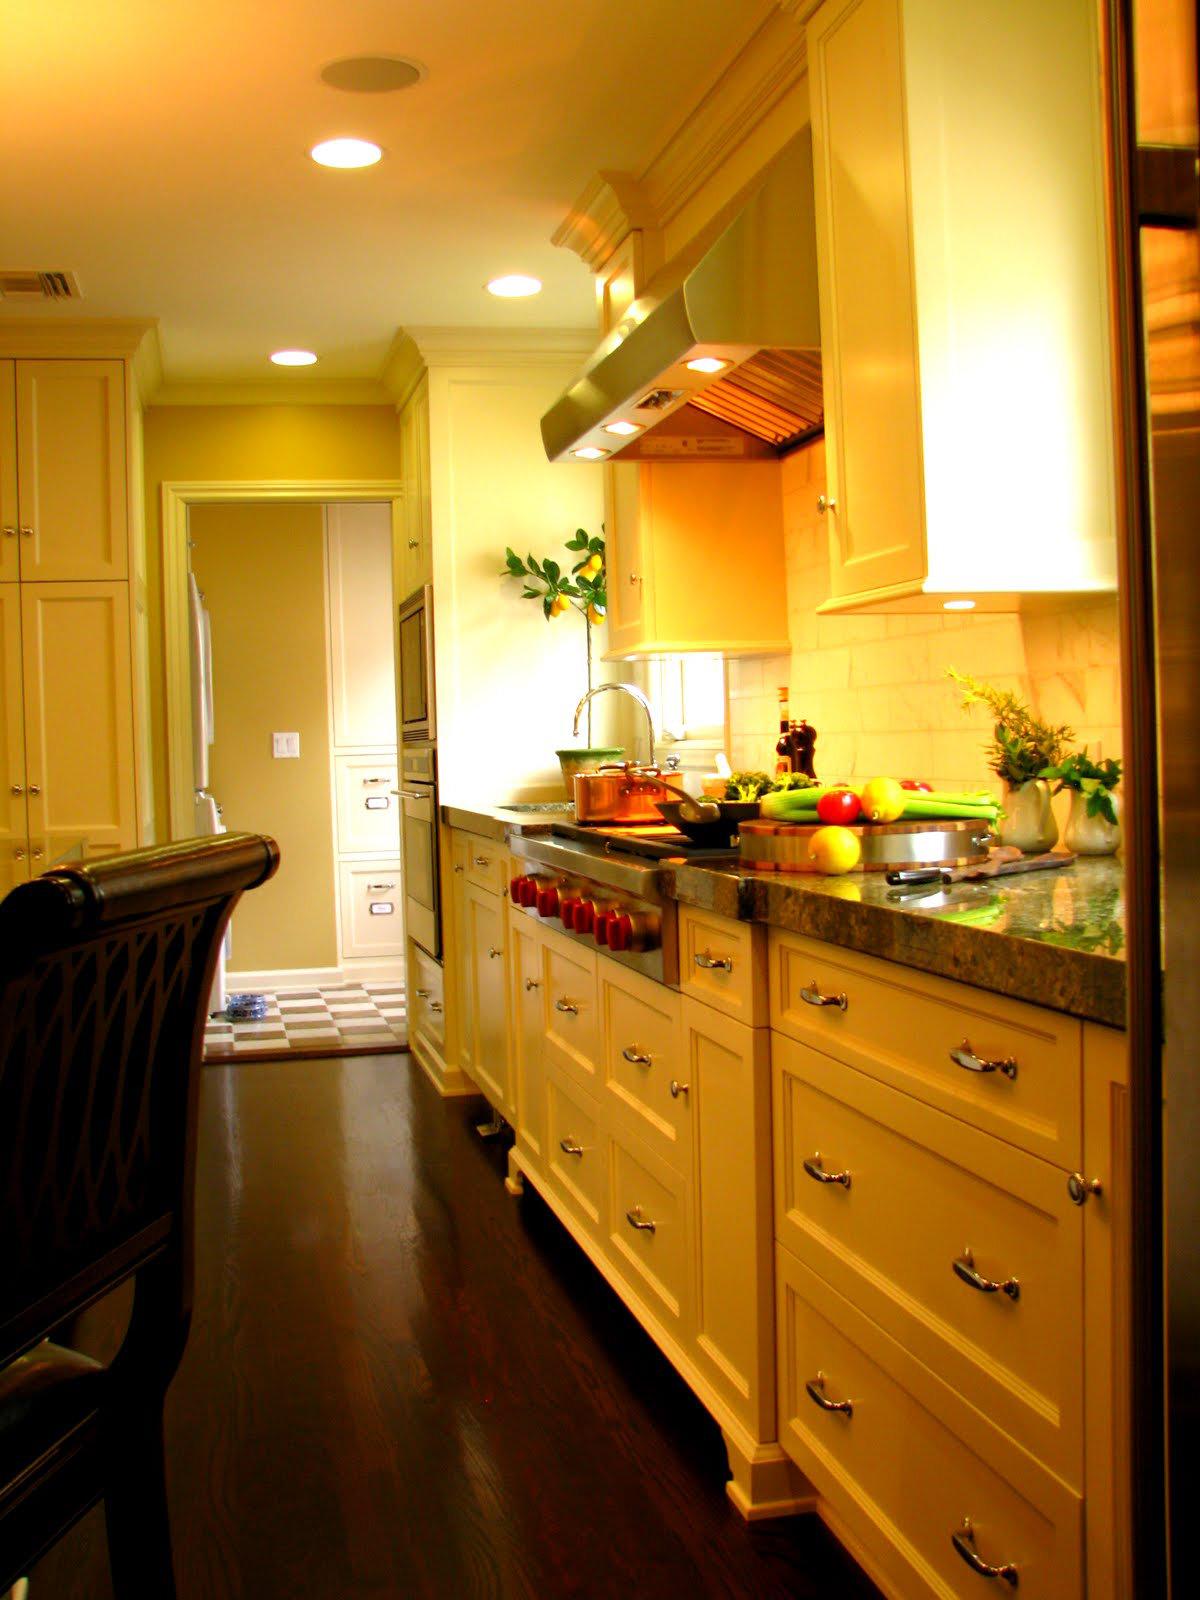 beverlywood-california-kitchen-remodel-interior-design-montgomery-home-3.jpg